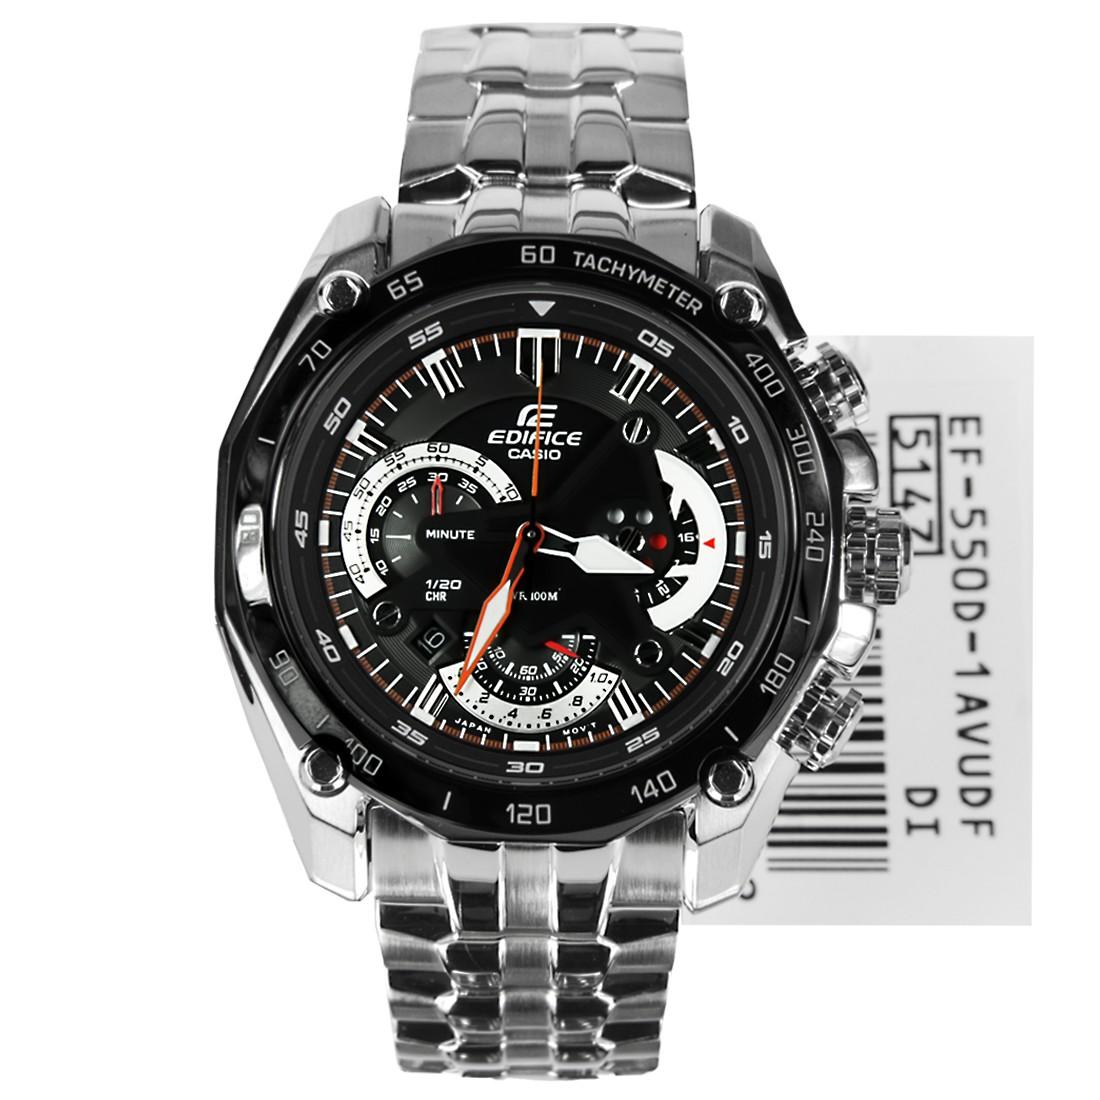 Reloj Casio Edifice Pb Ef 550 strdChQx